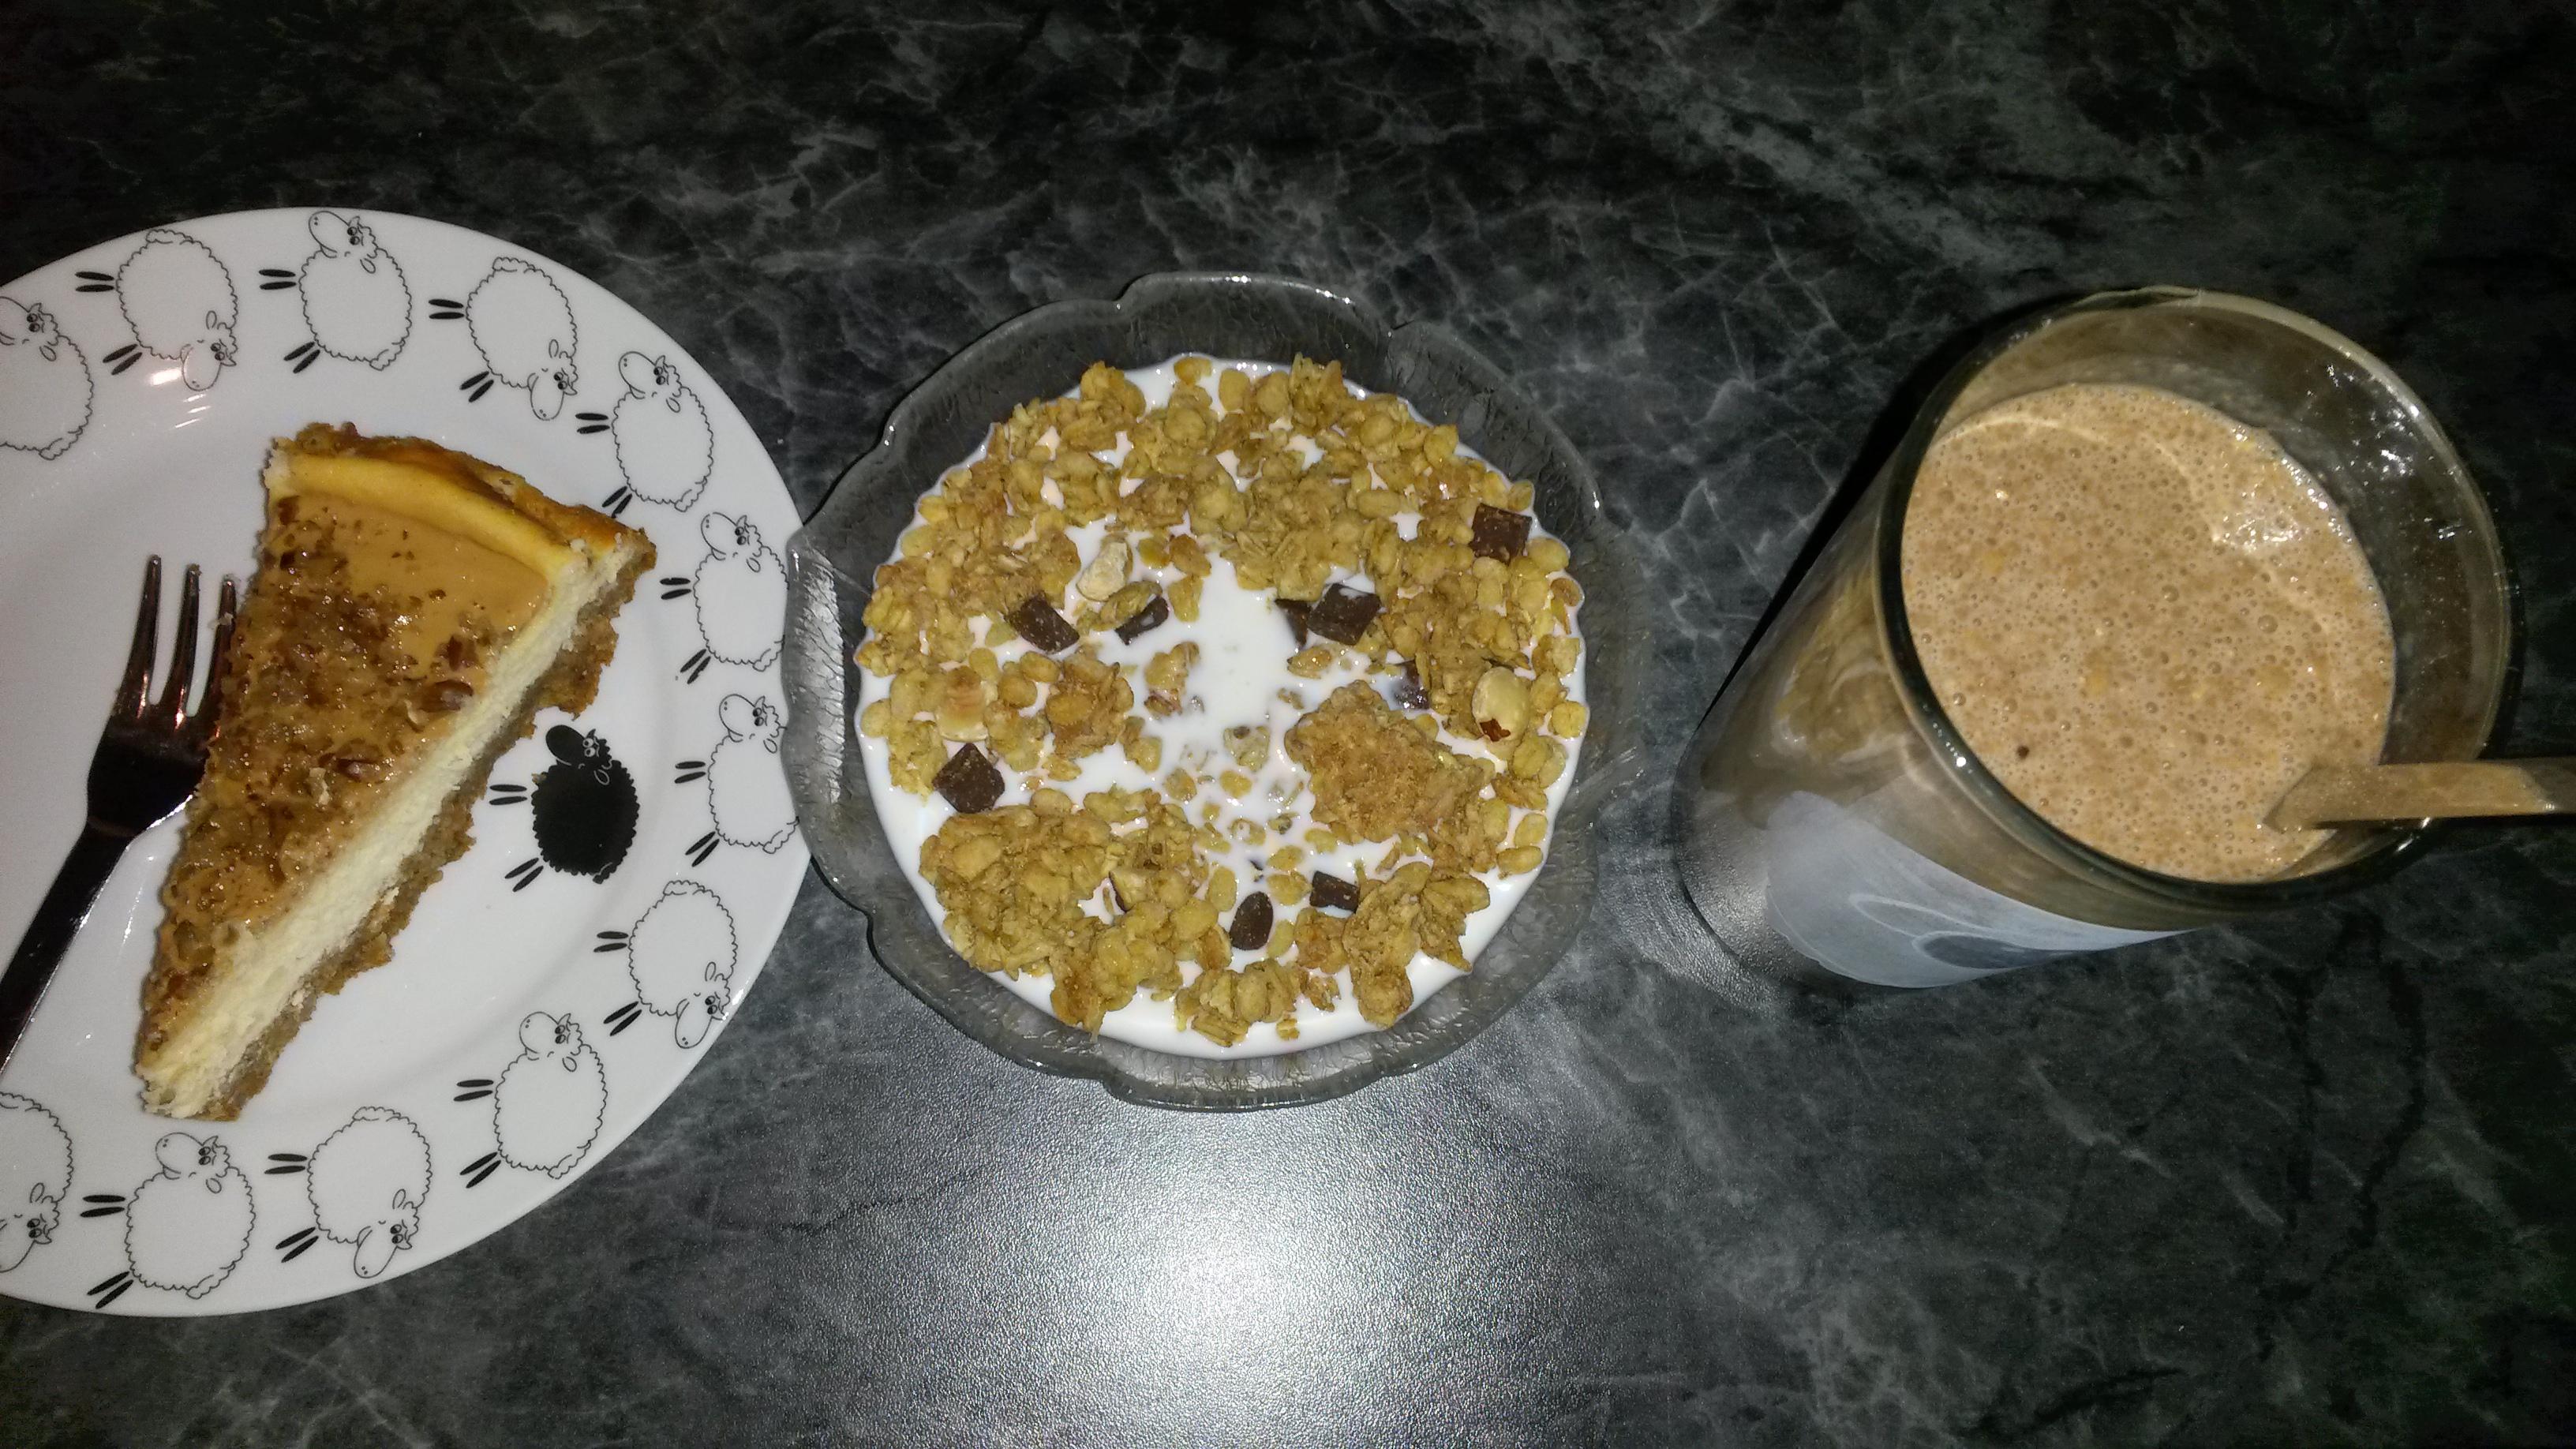 http://foodloader.net/sk0r_2014-02-18_Proteinshake_Muesli_Karamellkuchen.jpg